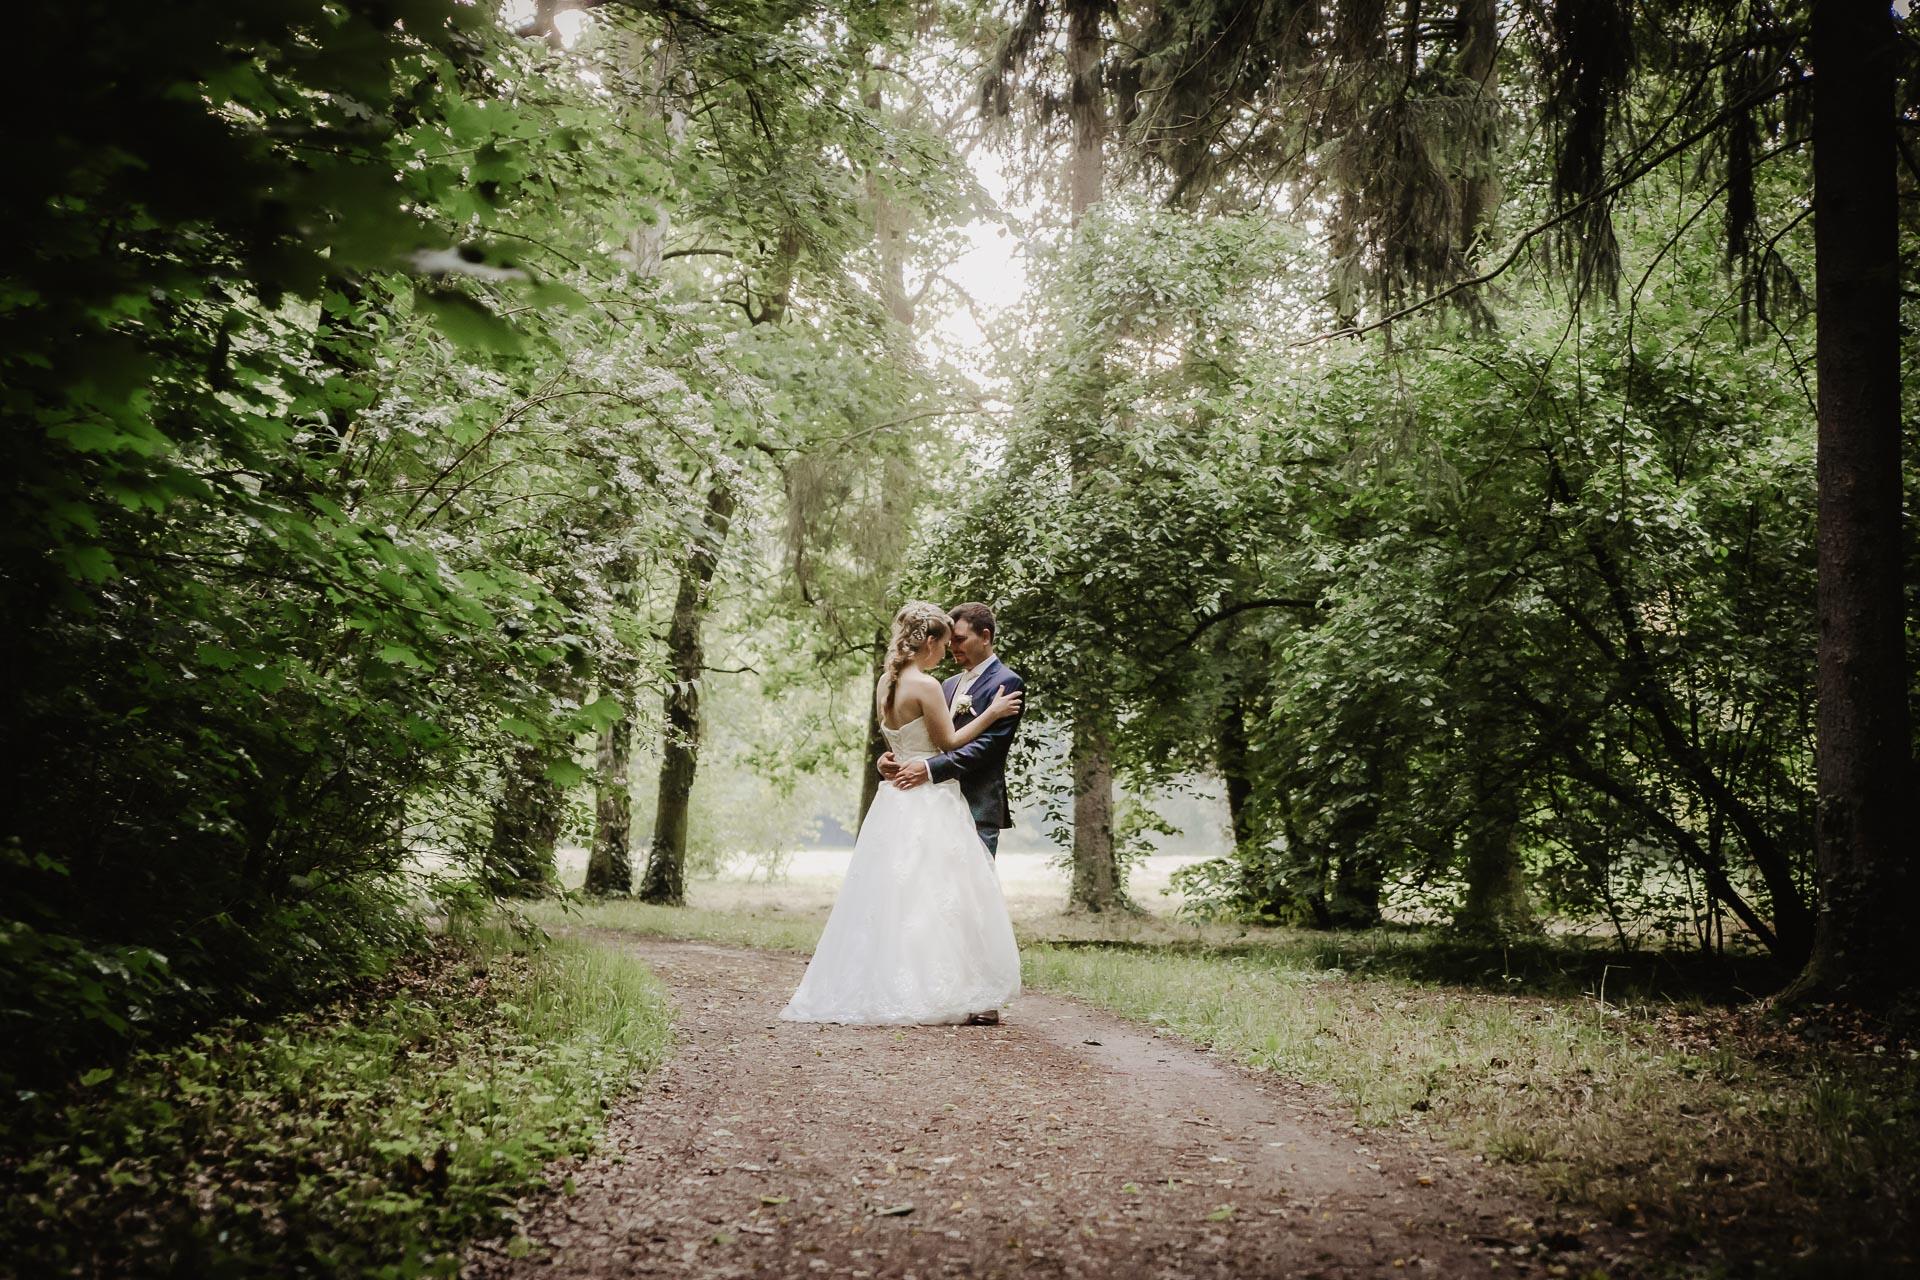 Svatební-fotograf-Nymburk-6417